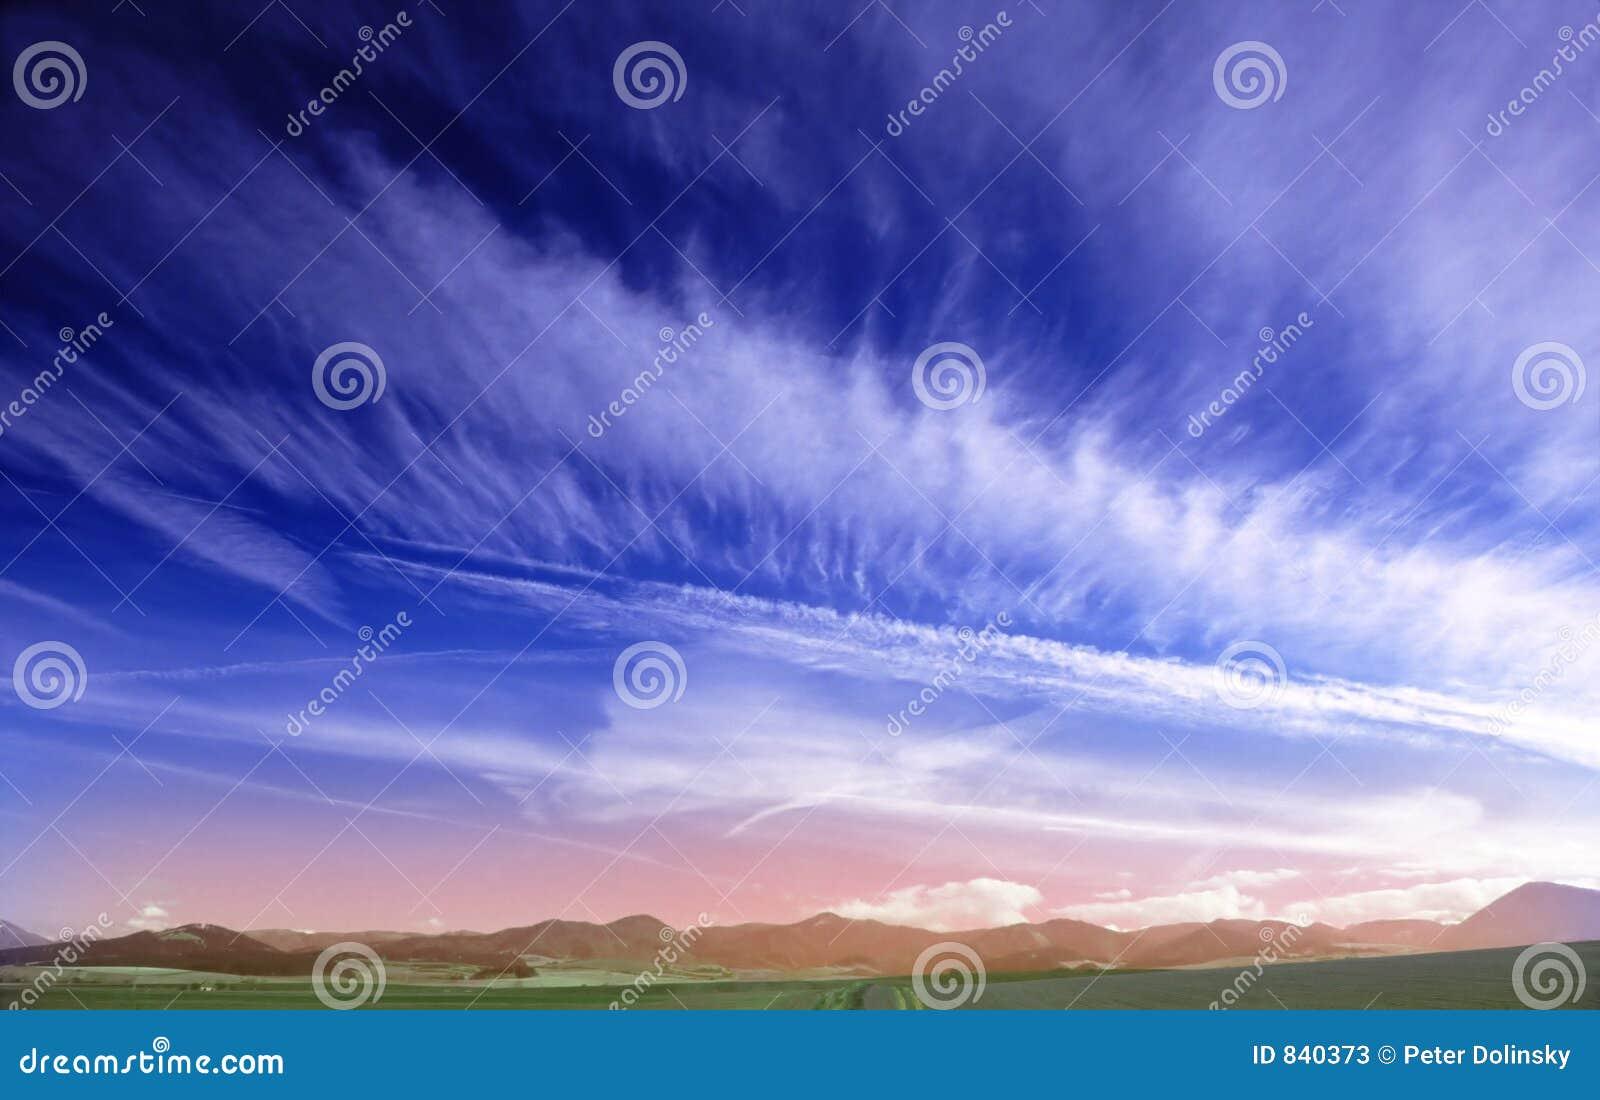 Ciel bleu profond